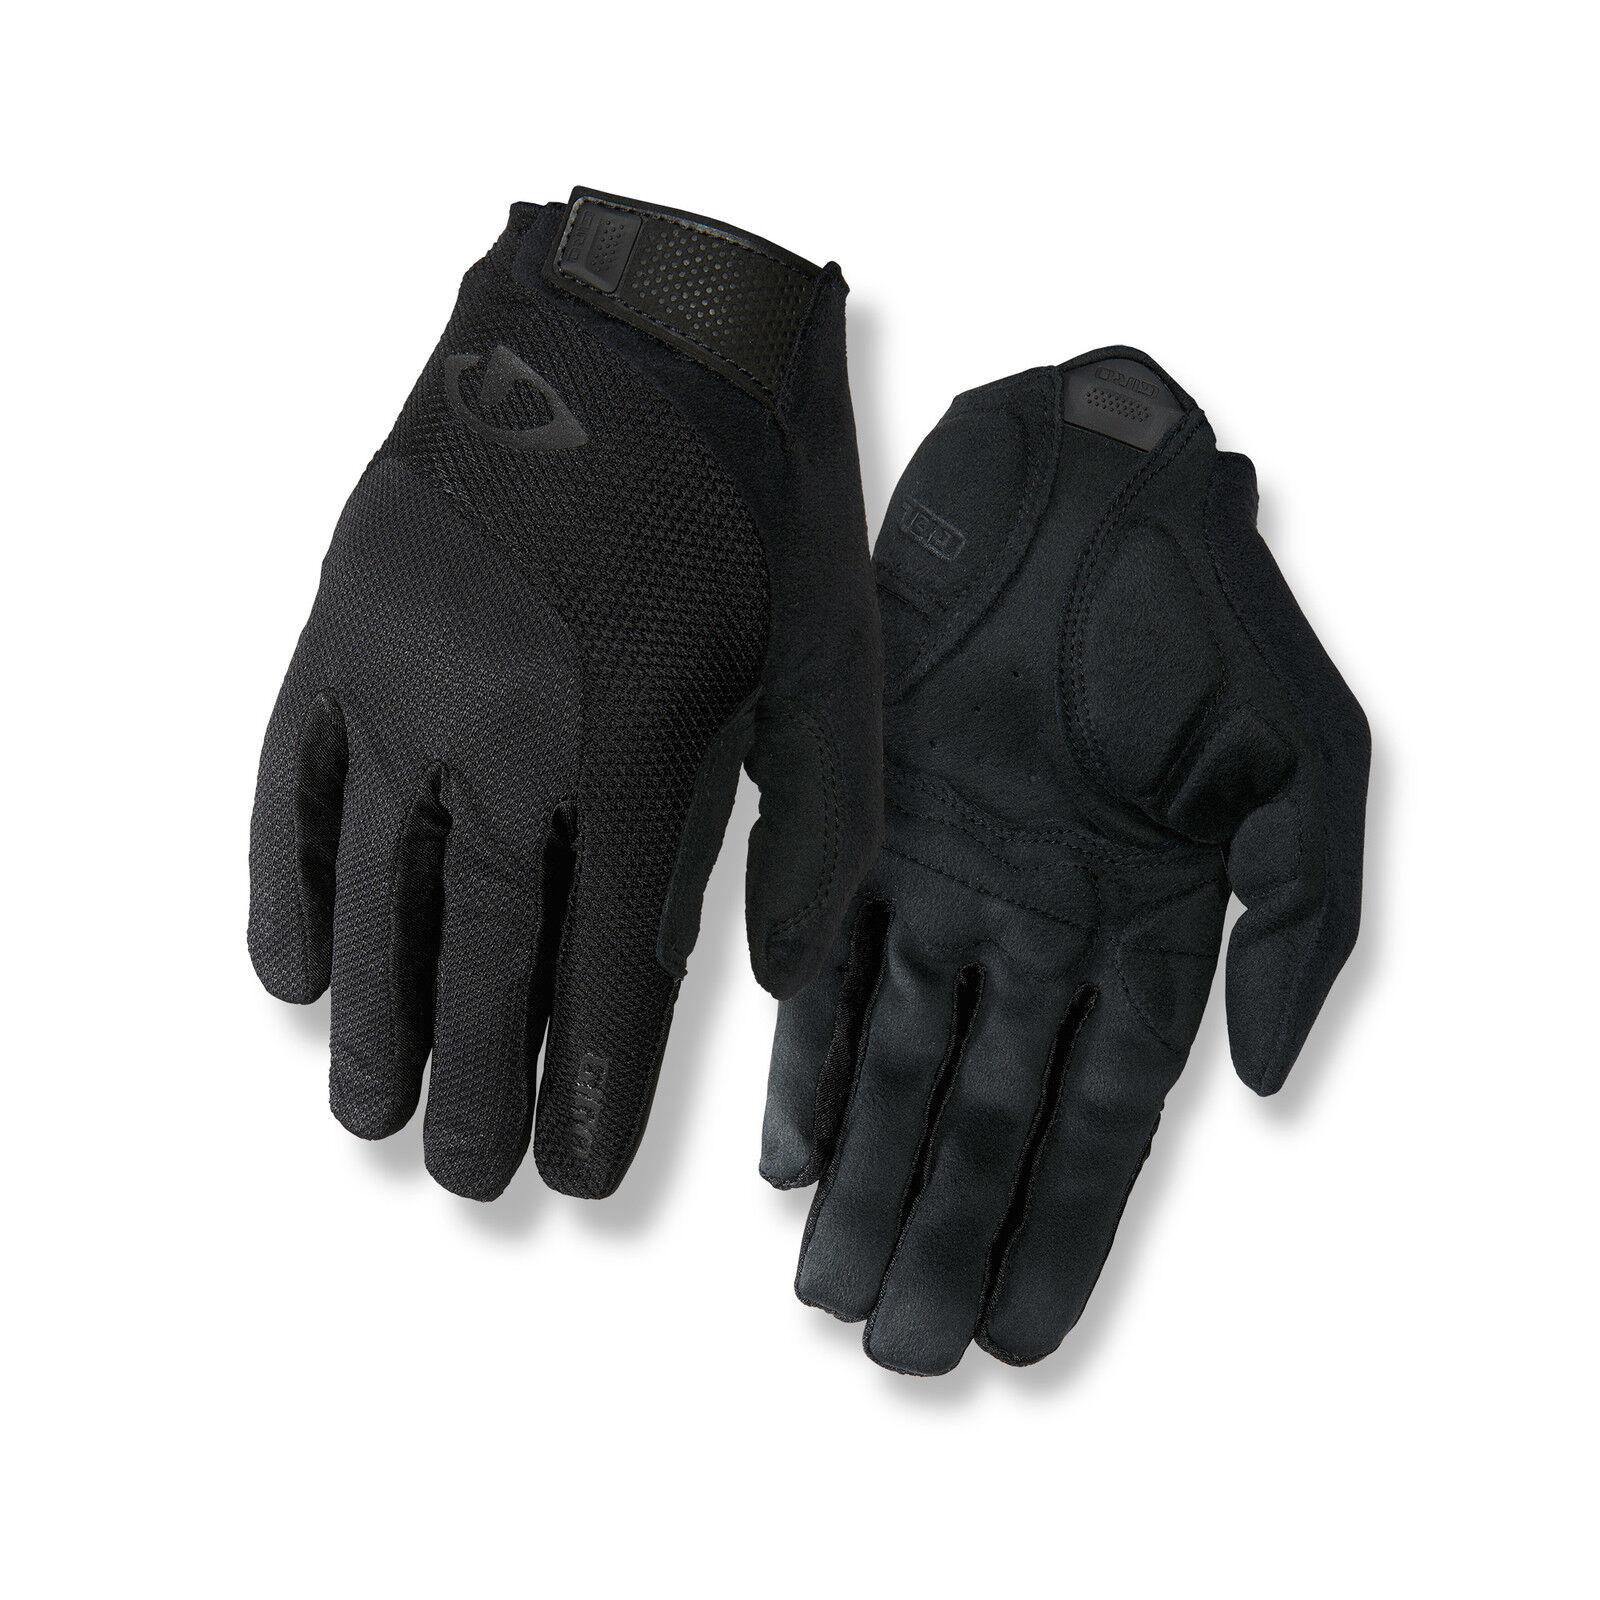 Giro Bravo Gel Fahrrad Handschuhe lang black 2019